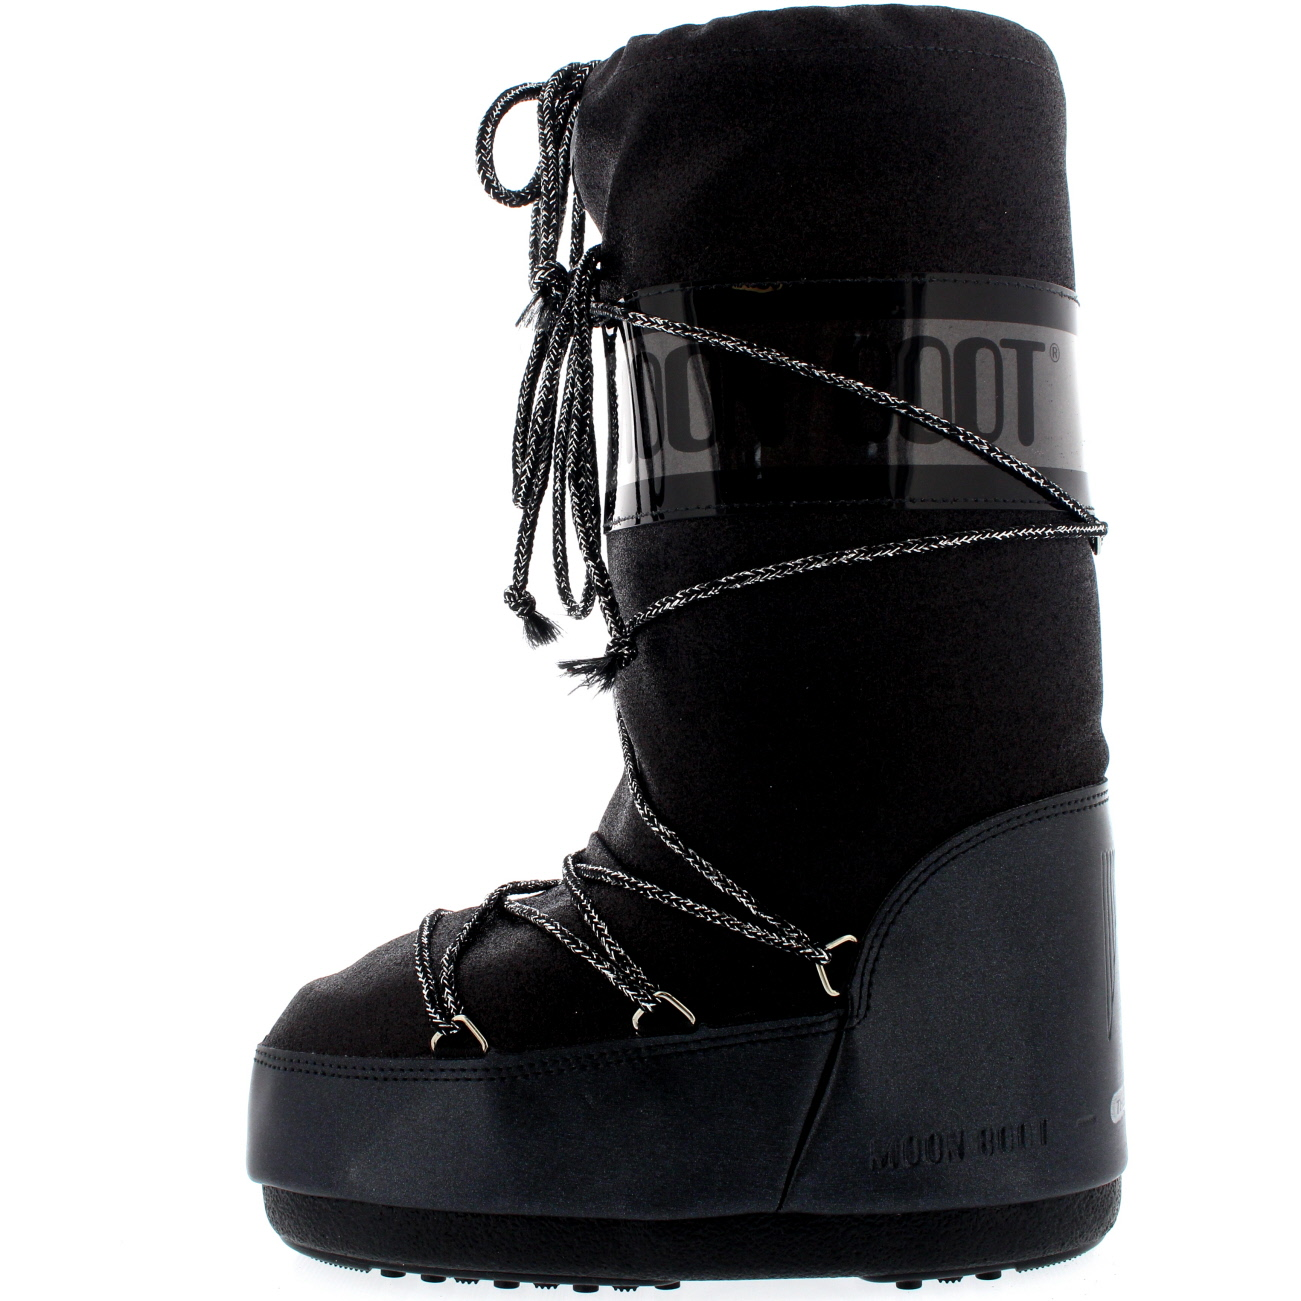 Womens Tecnica Moon Boot Delux Winter Wateproof Snow Mid